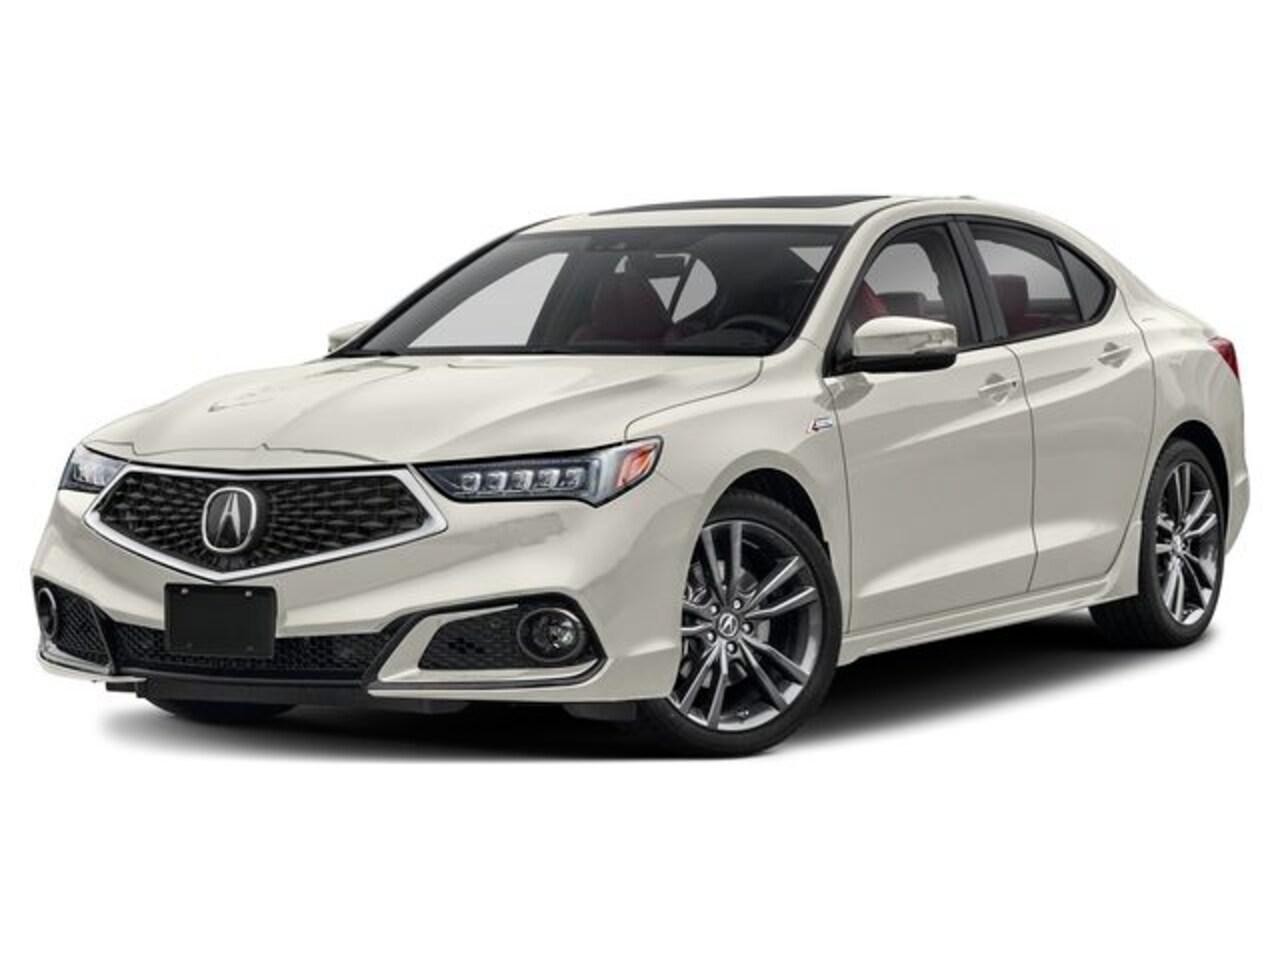 2020 Acura TLX 2.4L P-AWS w/Tech Pkg A-Spec Red Sedan